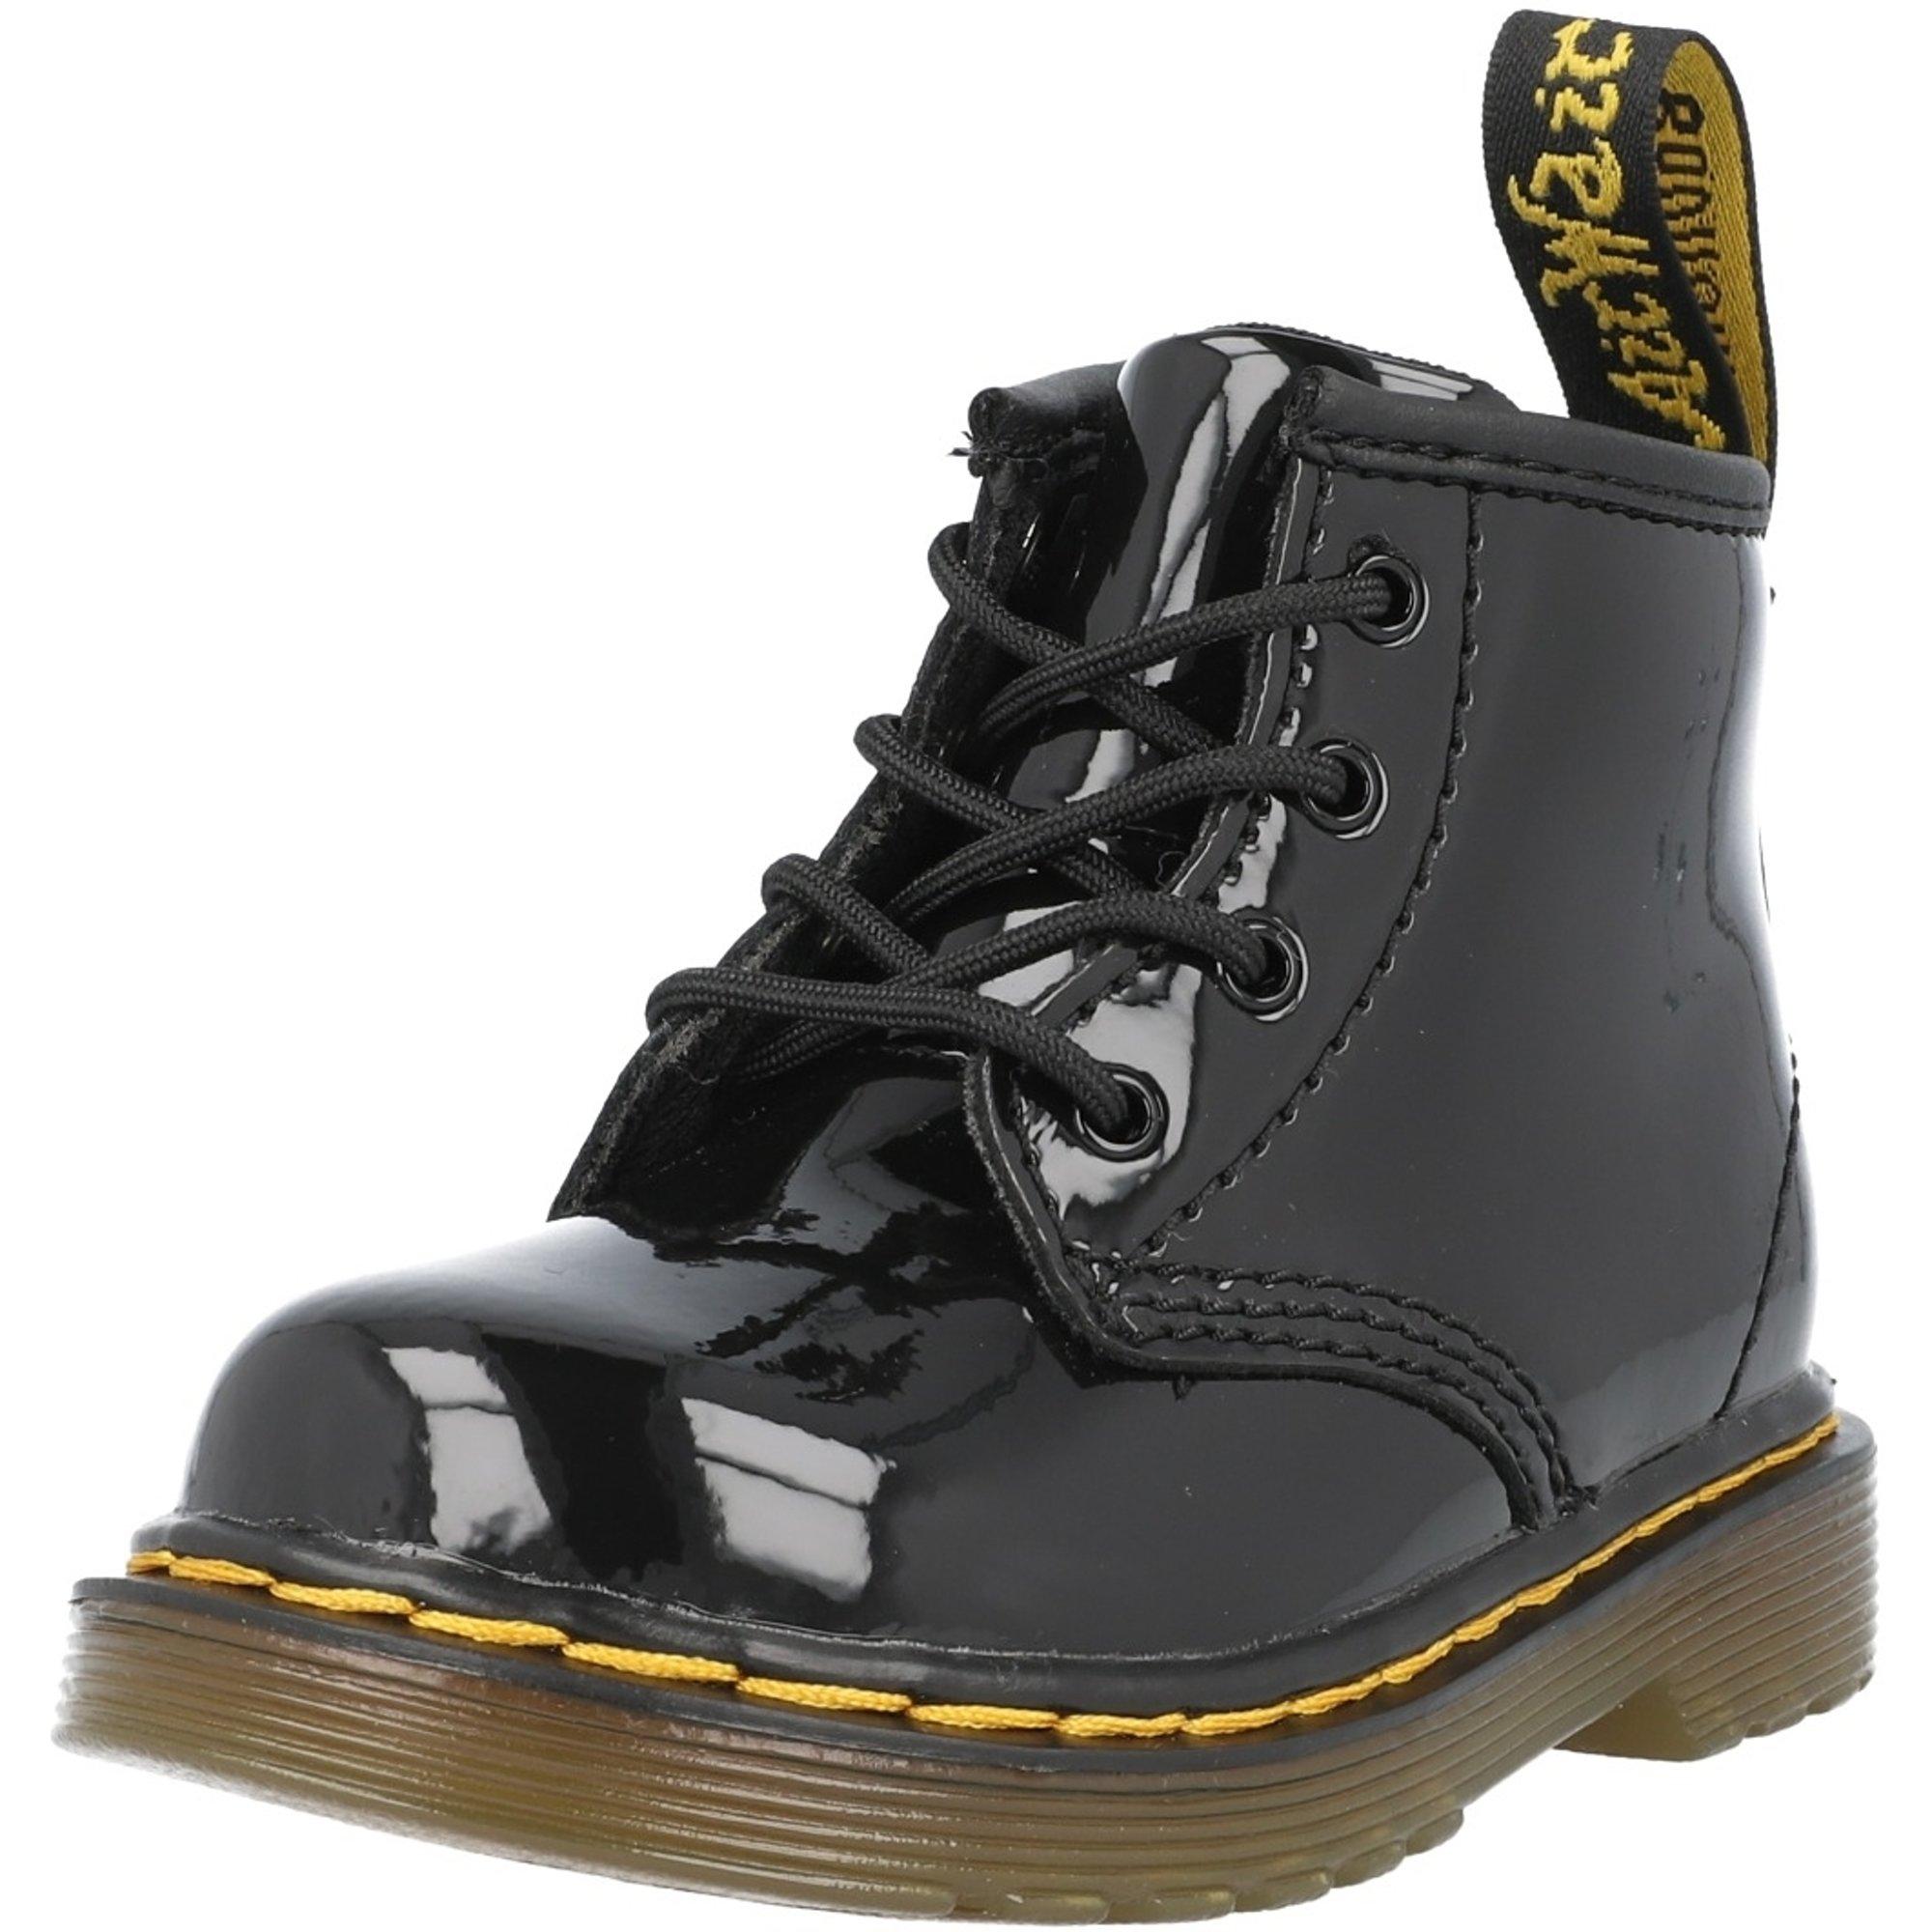 su Erudito Ejercicio mañanero  Dr Martens 1460 I Negro Charol - Tobillo Botas - Awesome Shoes